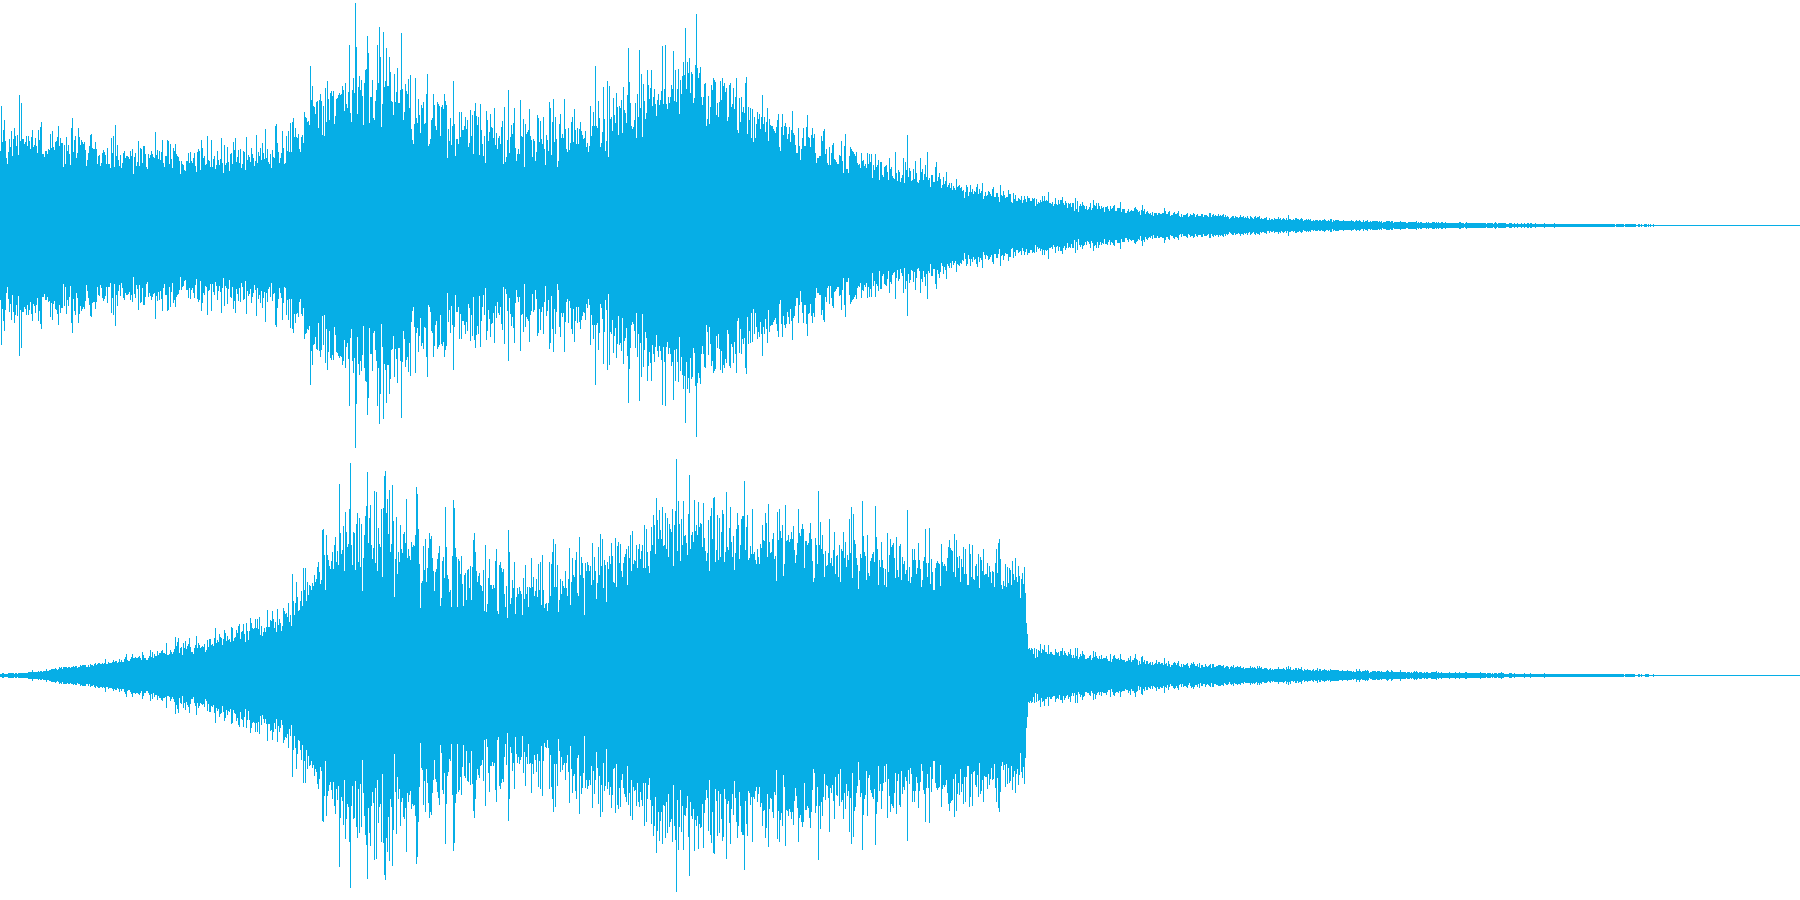 RadioSFX ラジオなど曲前のSEの再生済みの波形